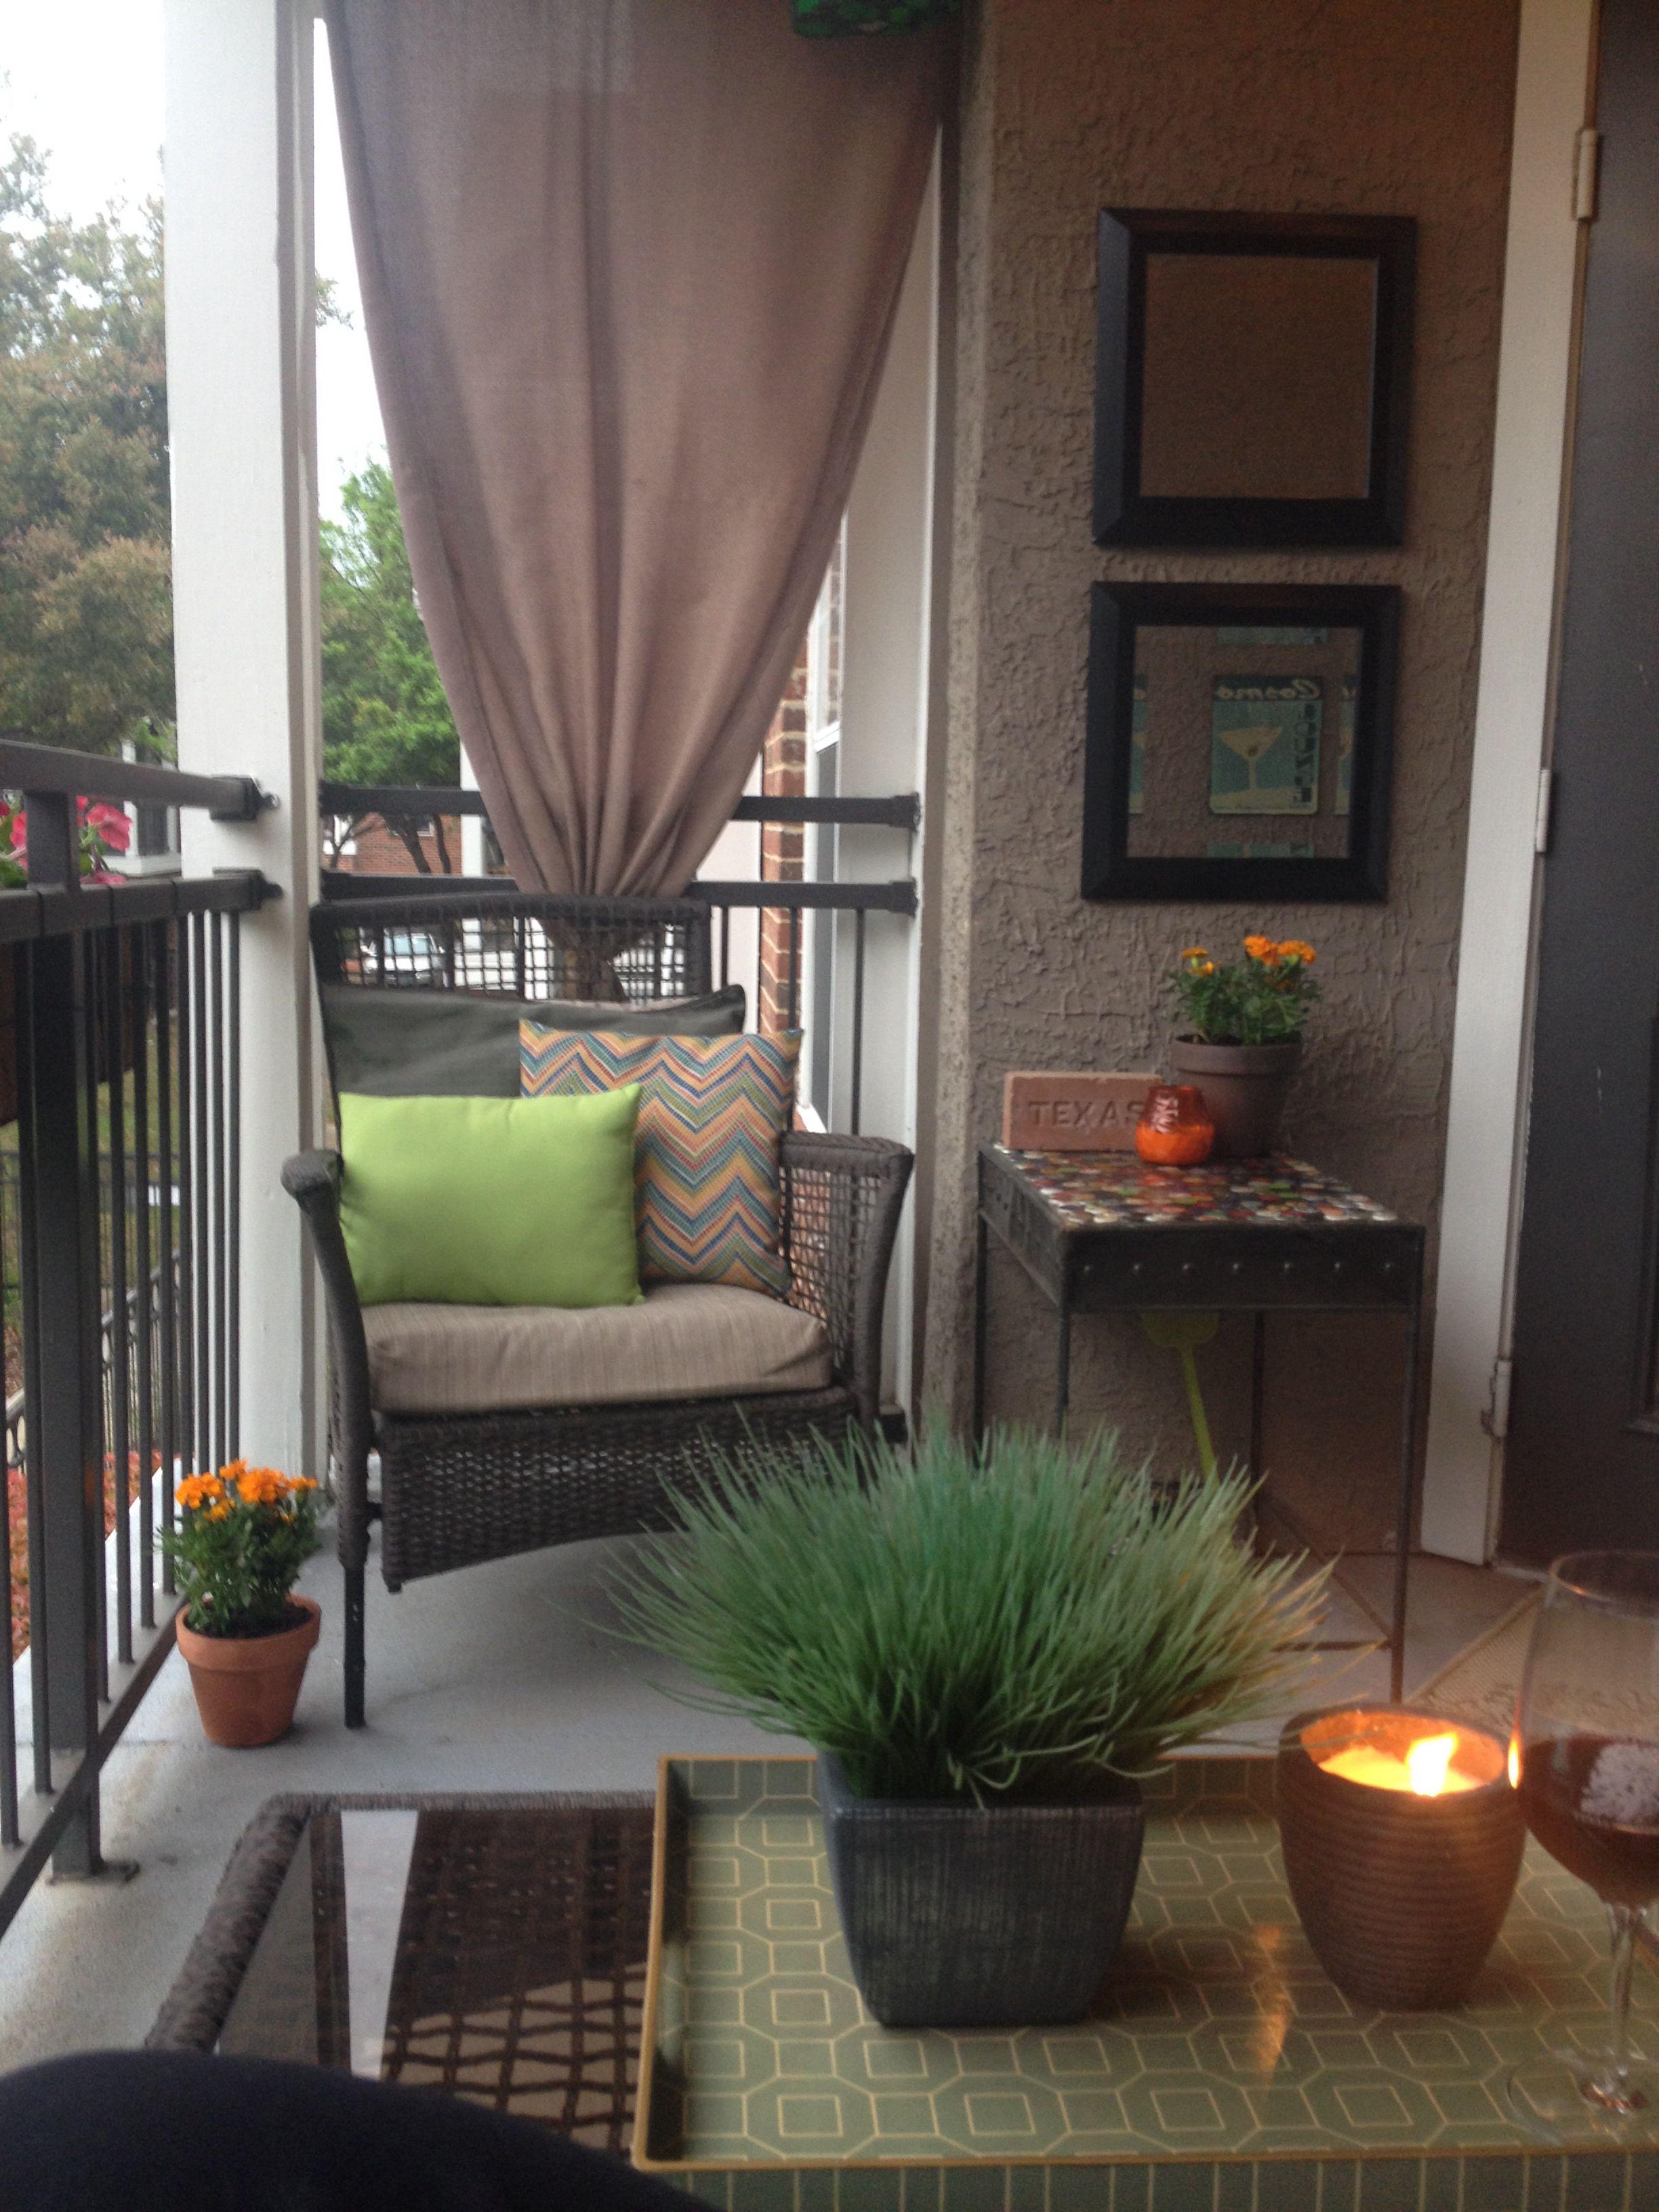 Apartment patio decor - Patio Apartment Patio Patio Decor